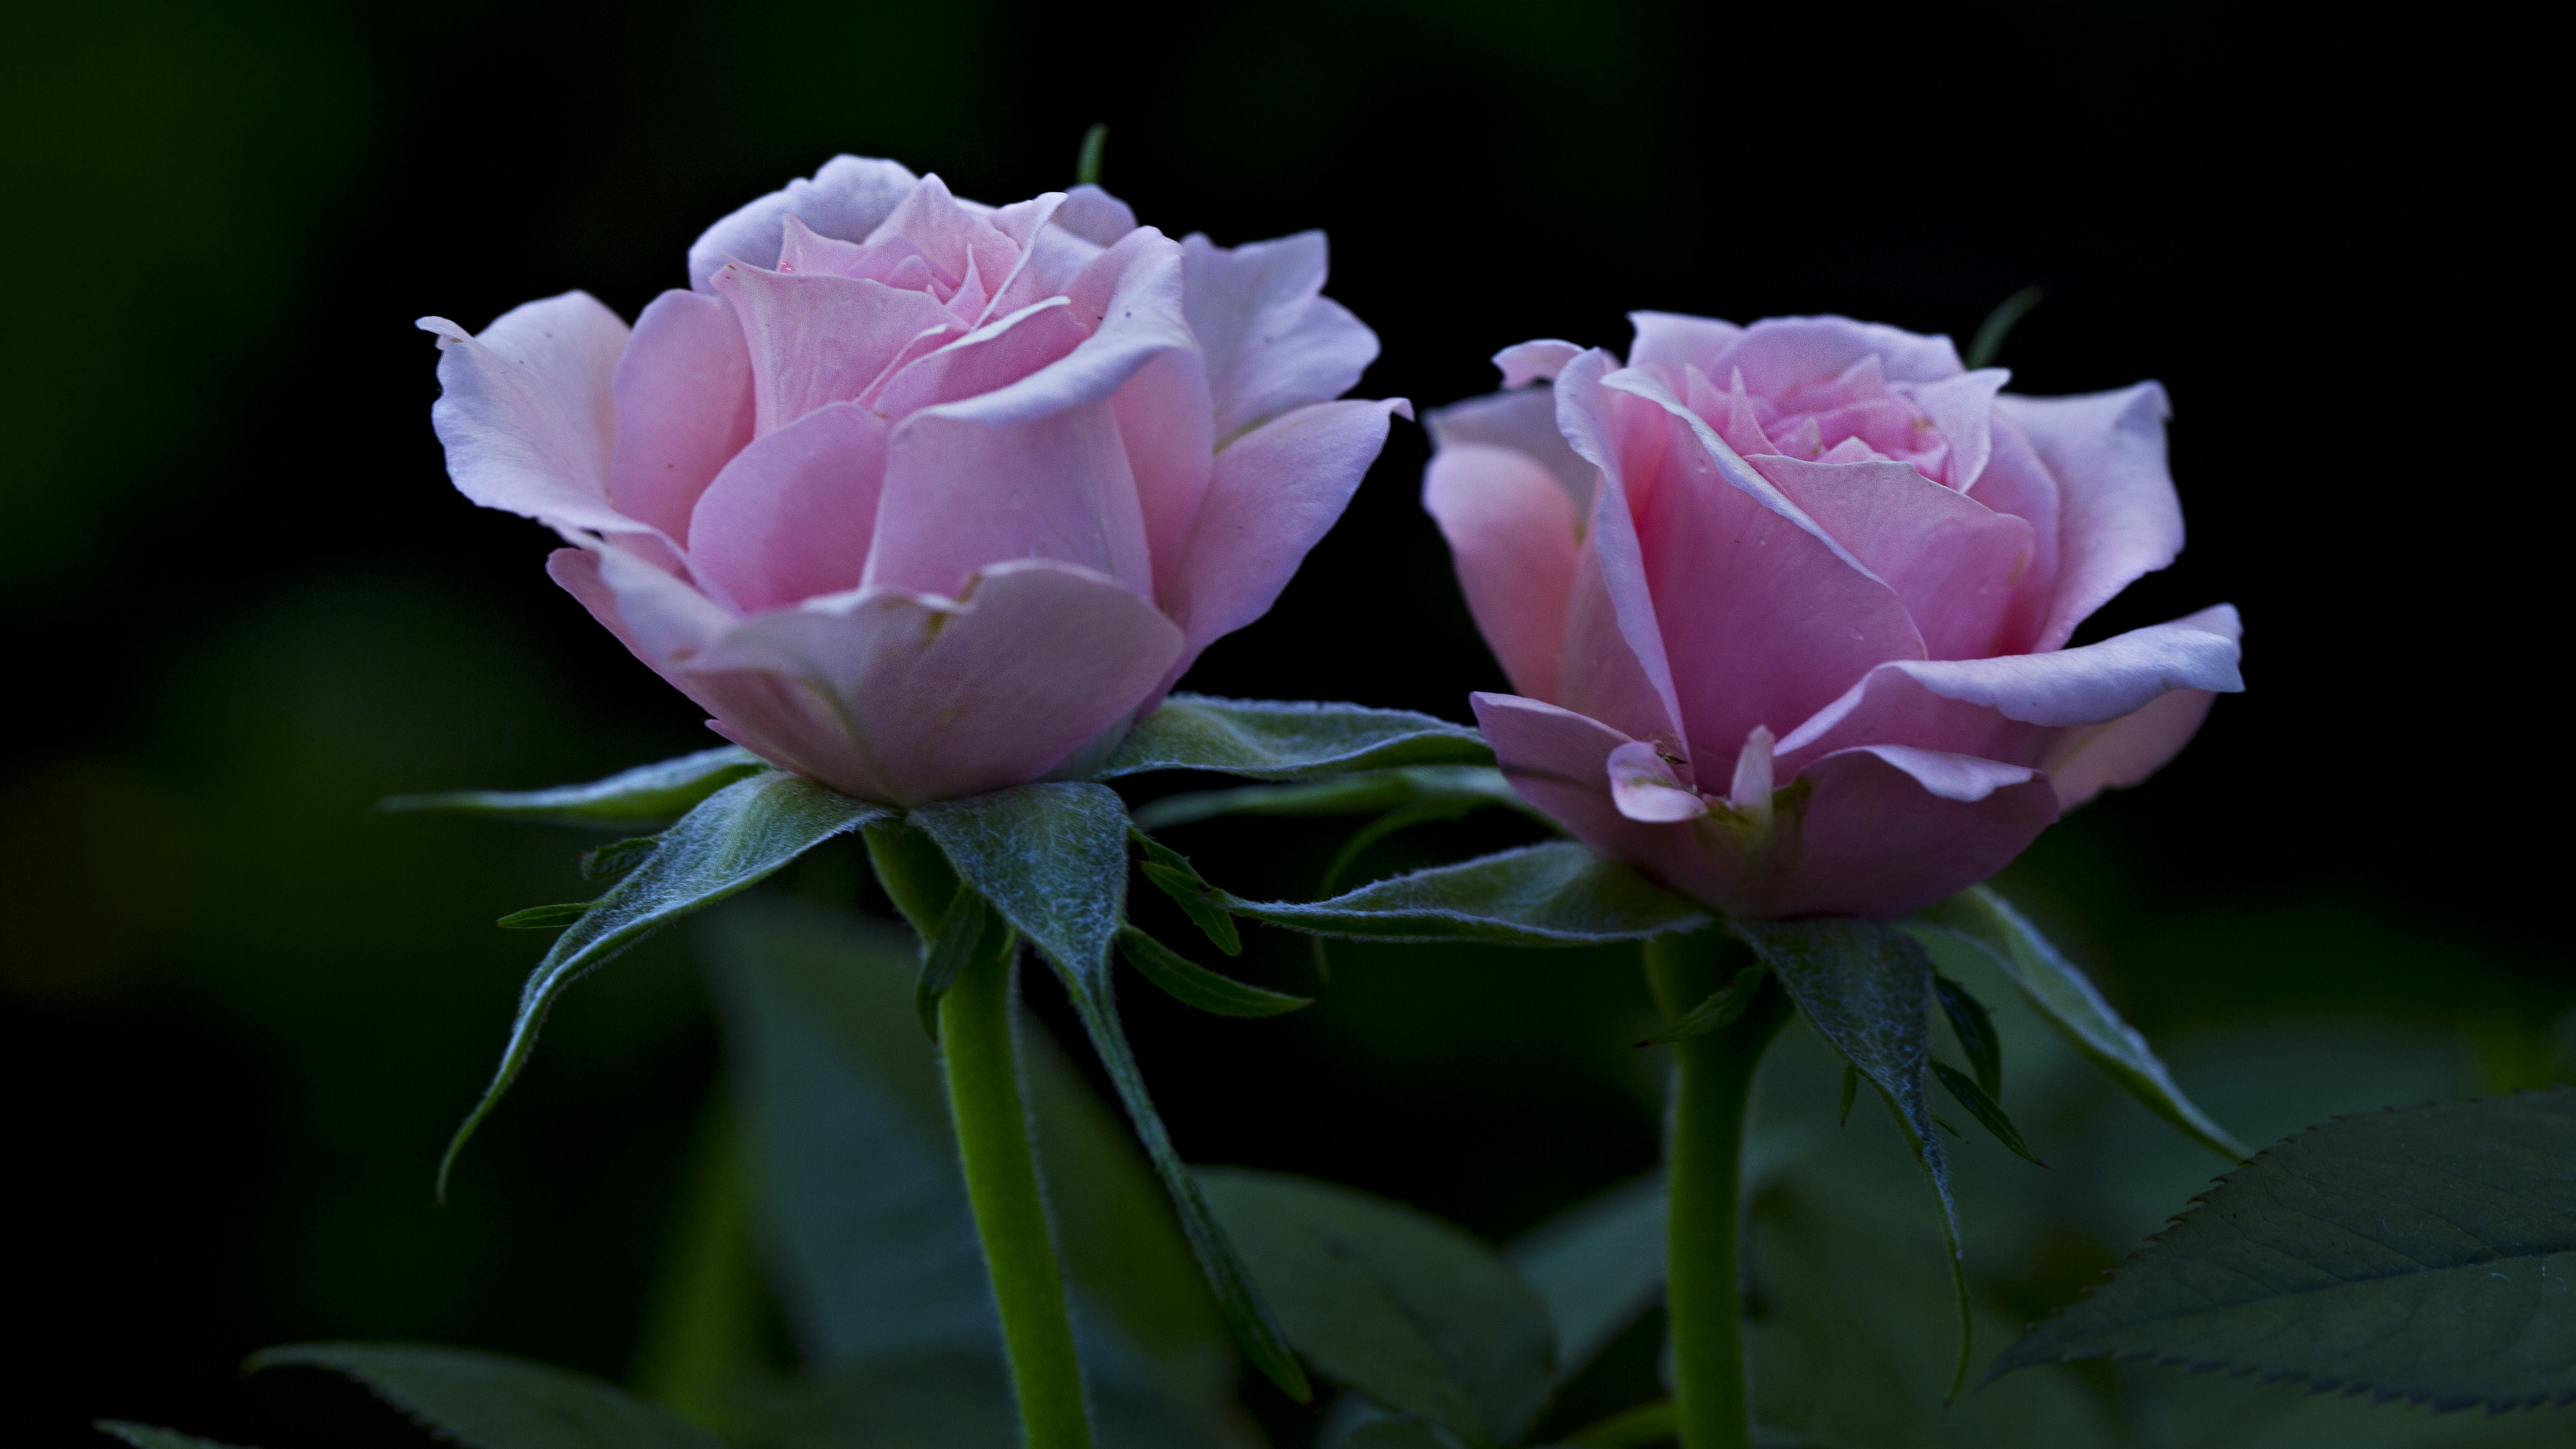 roses flowers petals buds 4k 1540064956 - roses, flowers, petals, buds 4k - Roses, Petals, Flowers